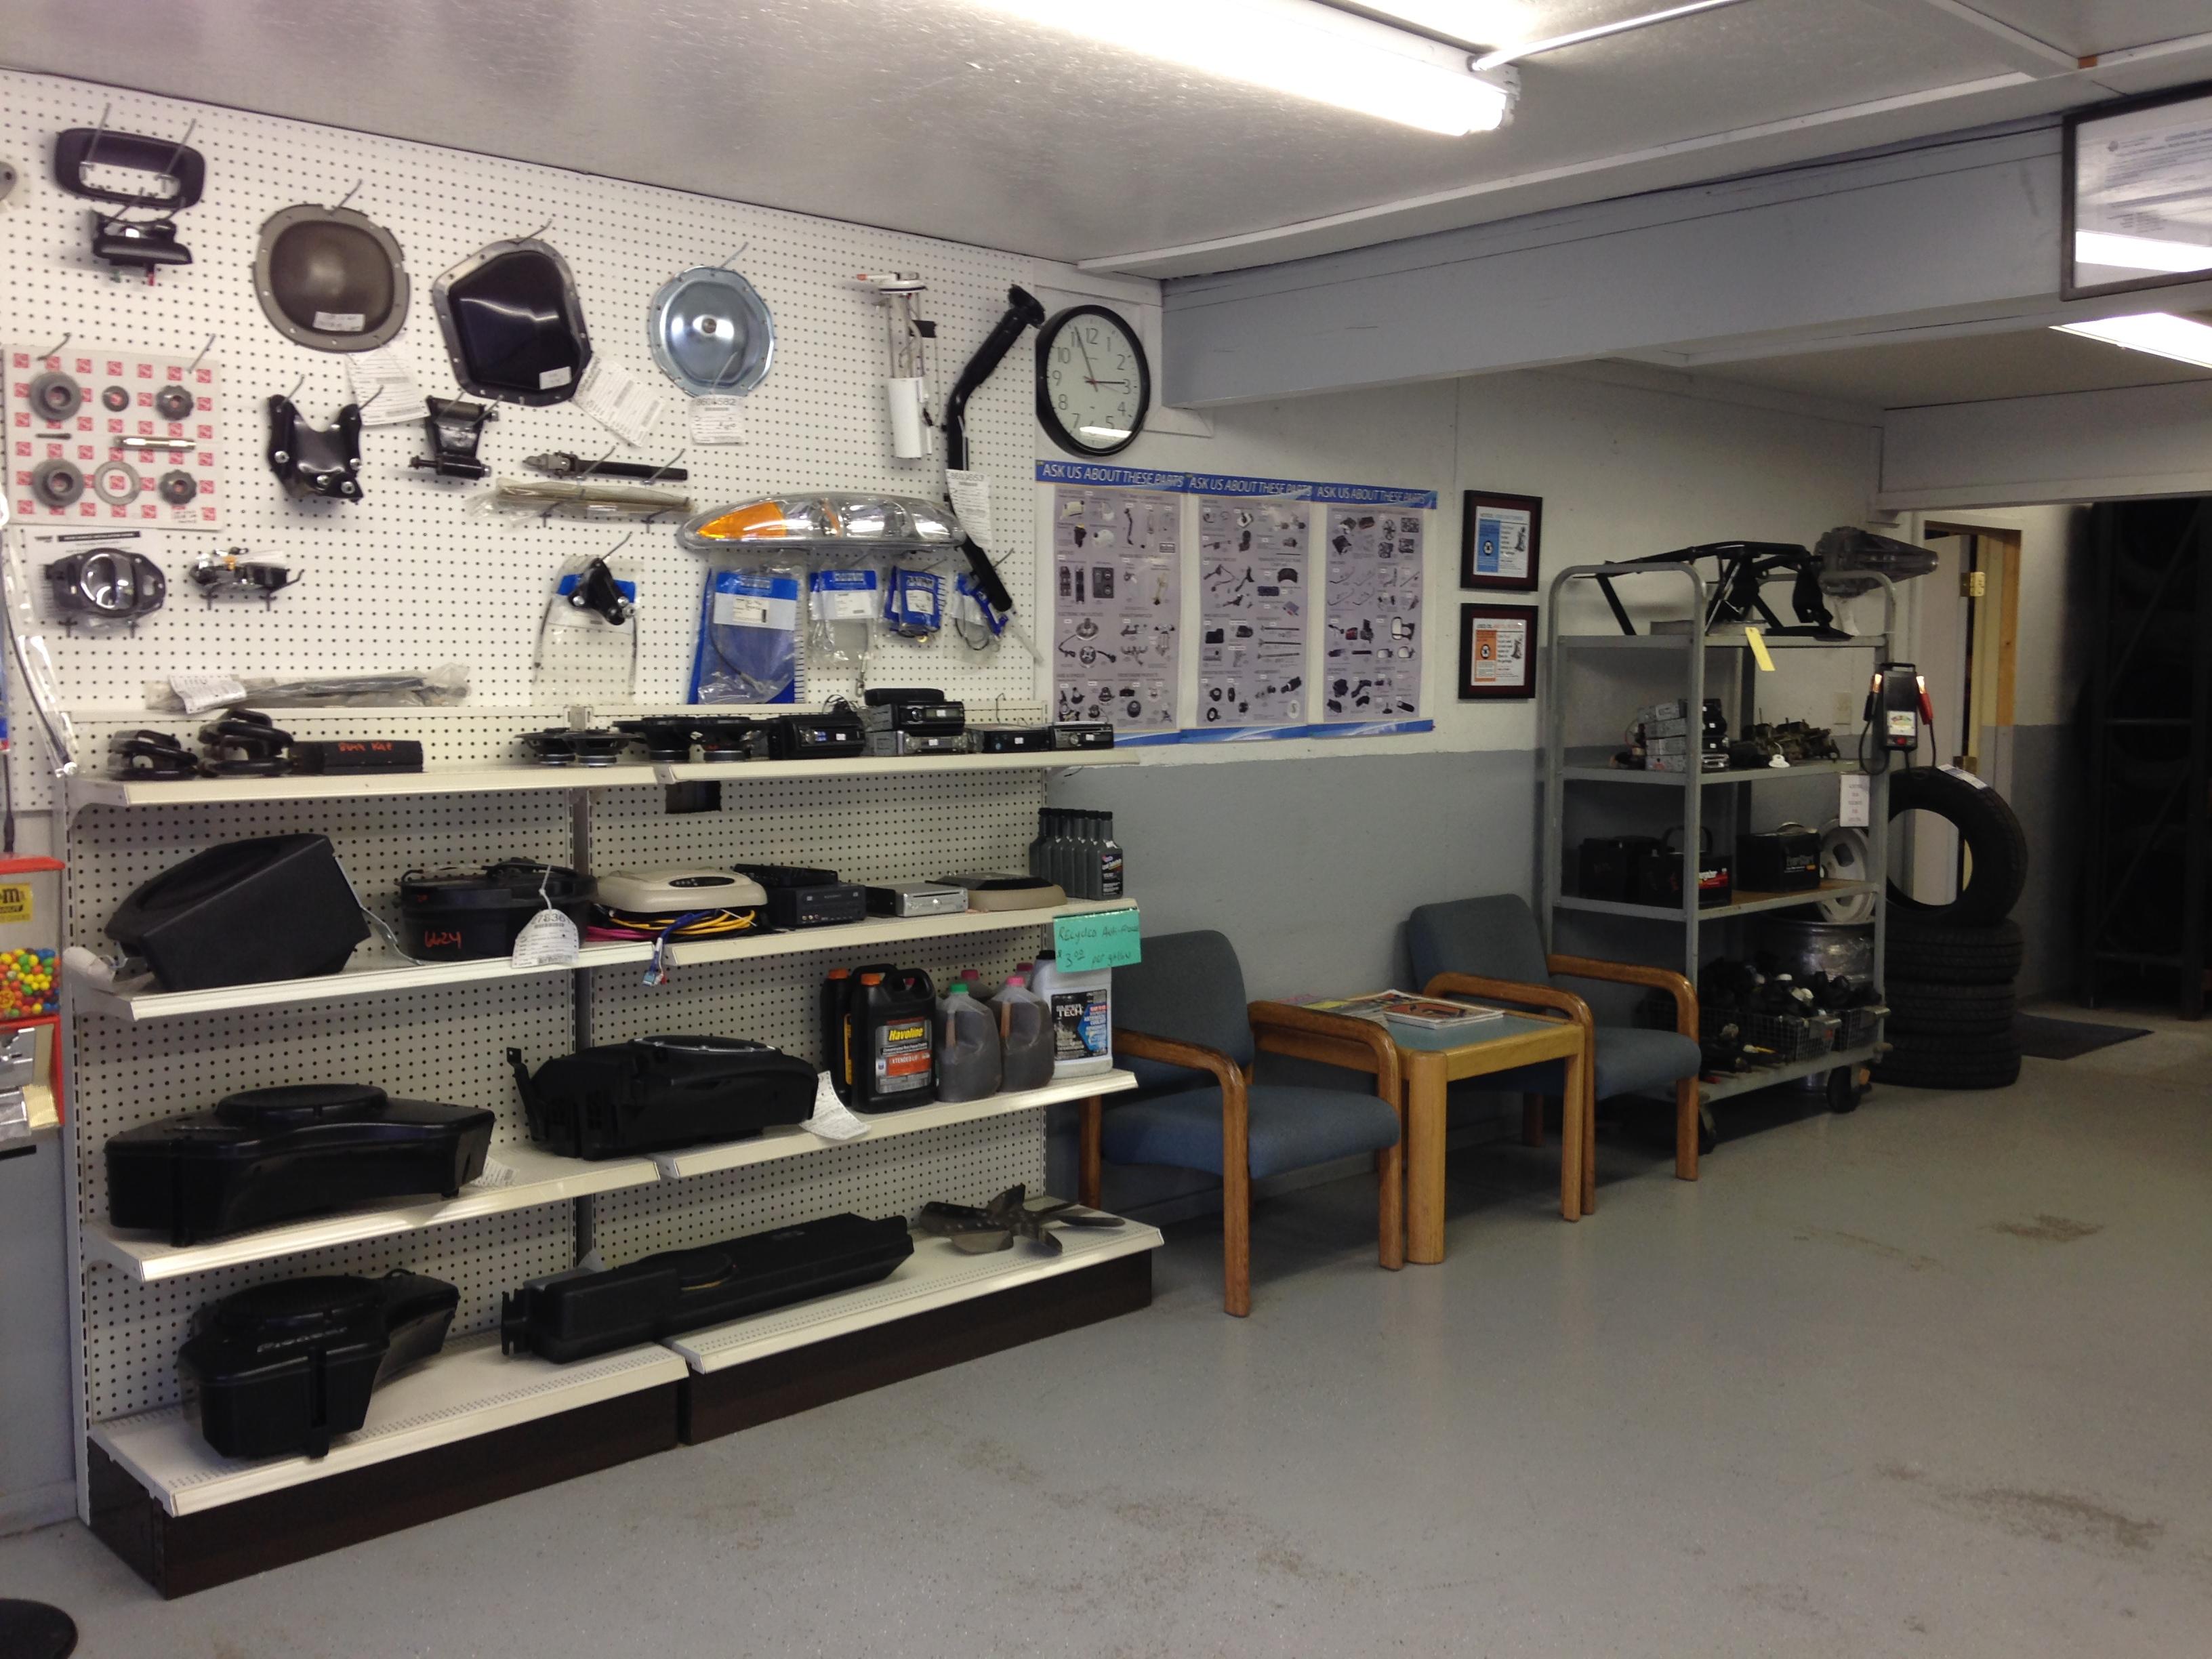 Car Parts Mn: Kelly Auto Parts In Faribault, MN